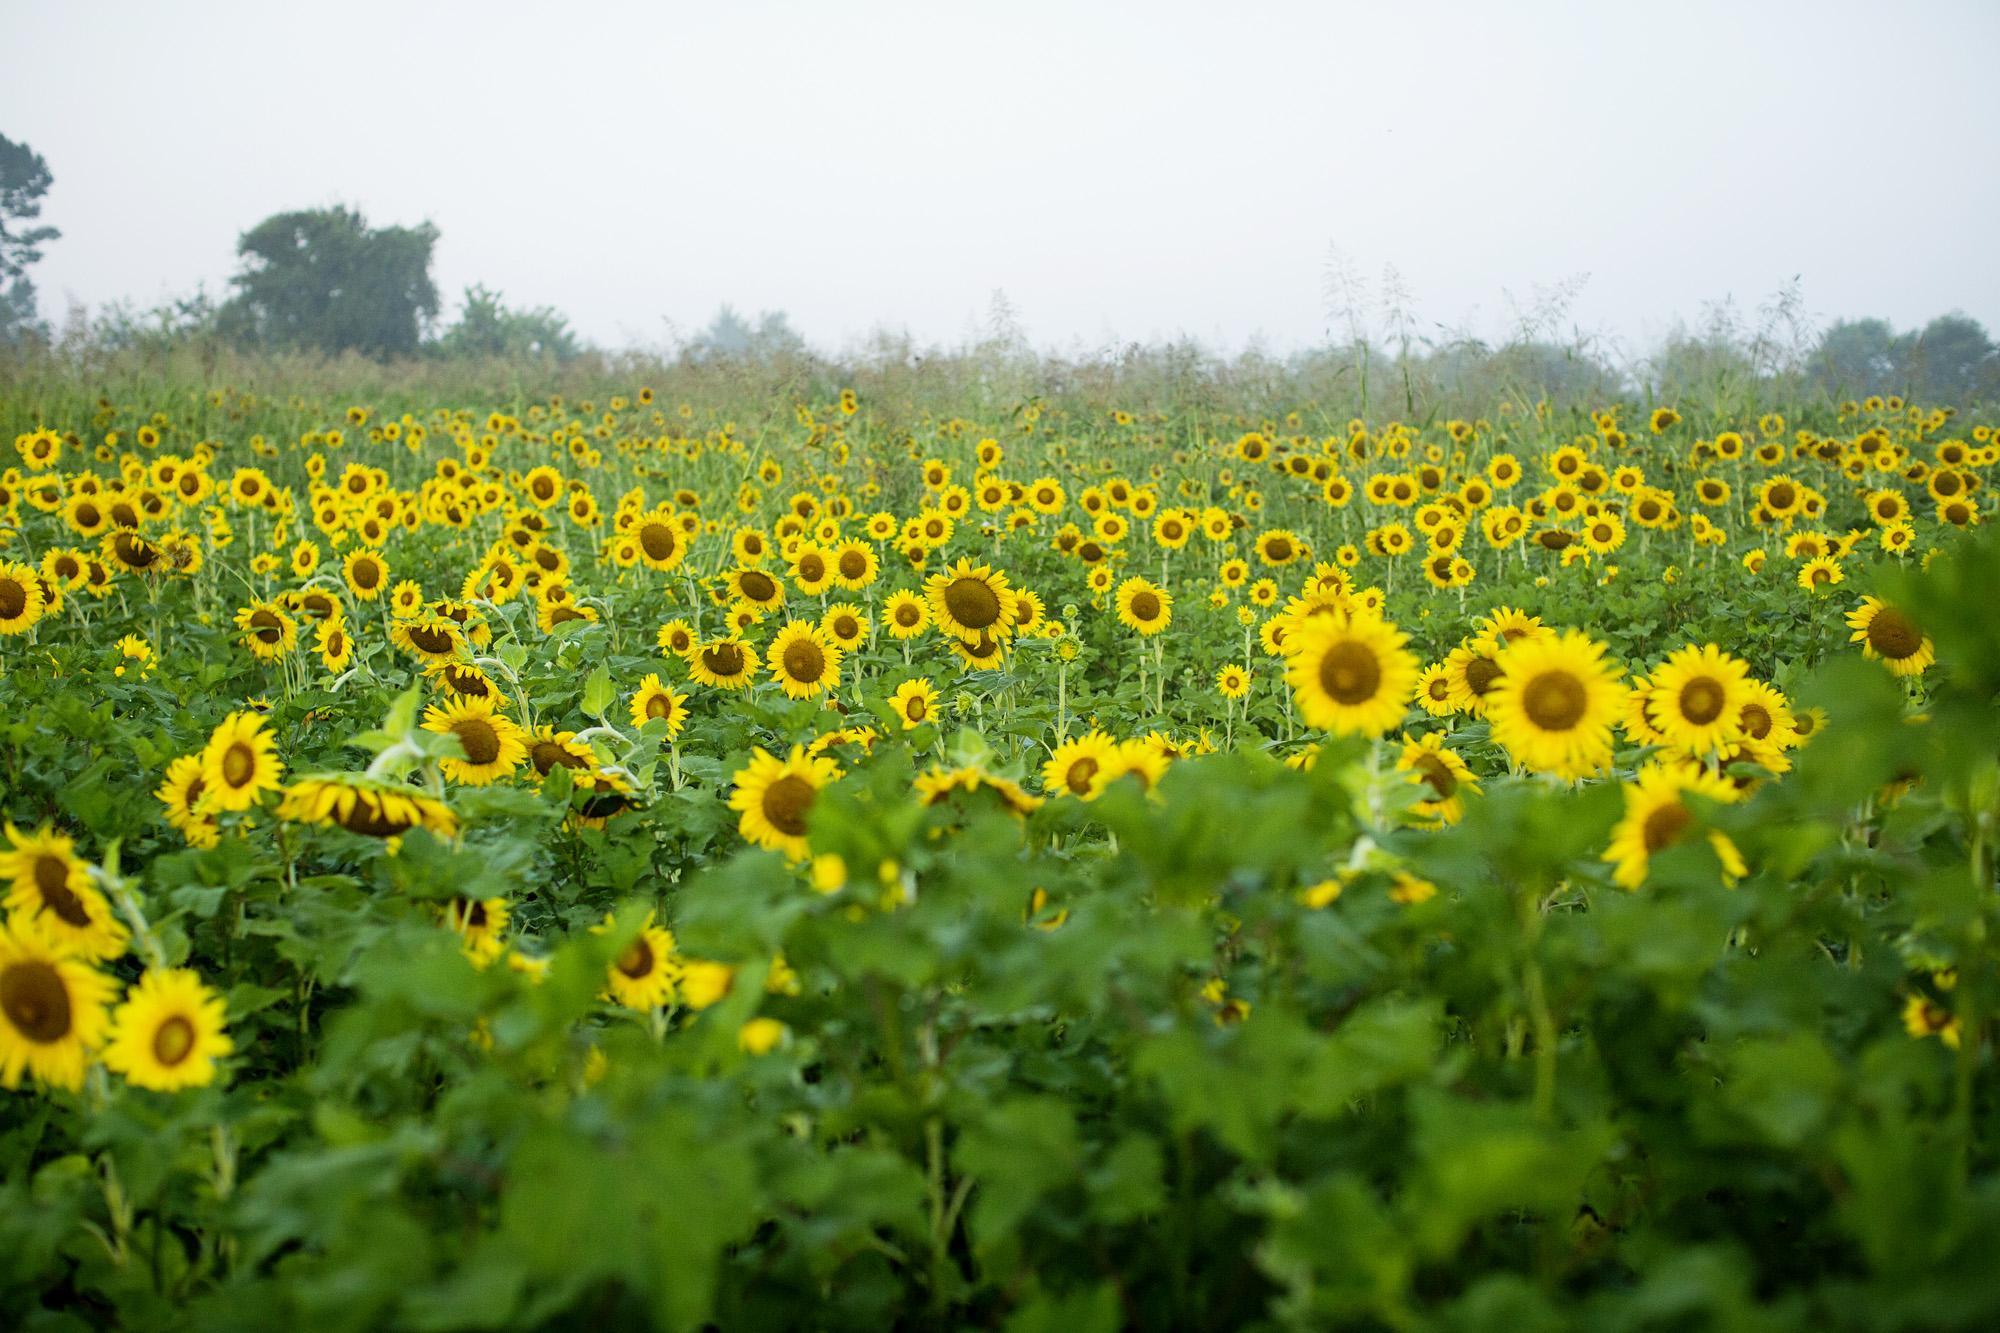 Seriously_Sabrina_Photography_Lexington_Frankfort_Kentucky_Maternity_Mini_Sunflowers_Johns7.jpg